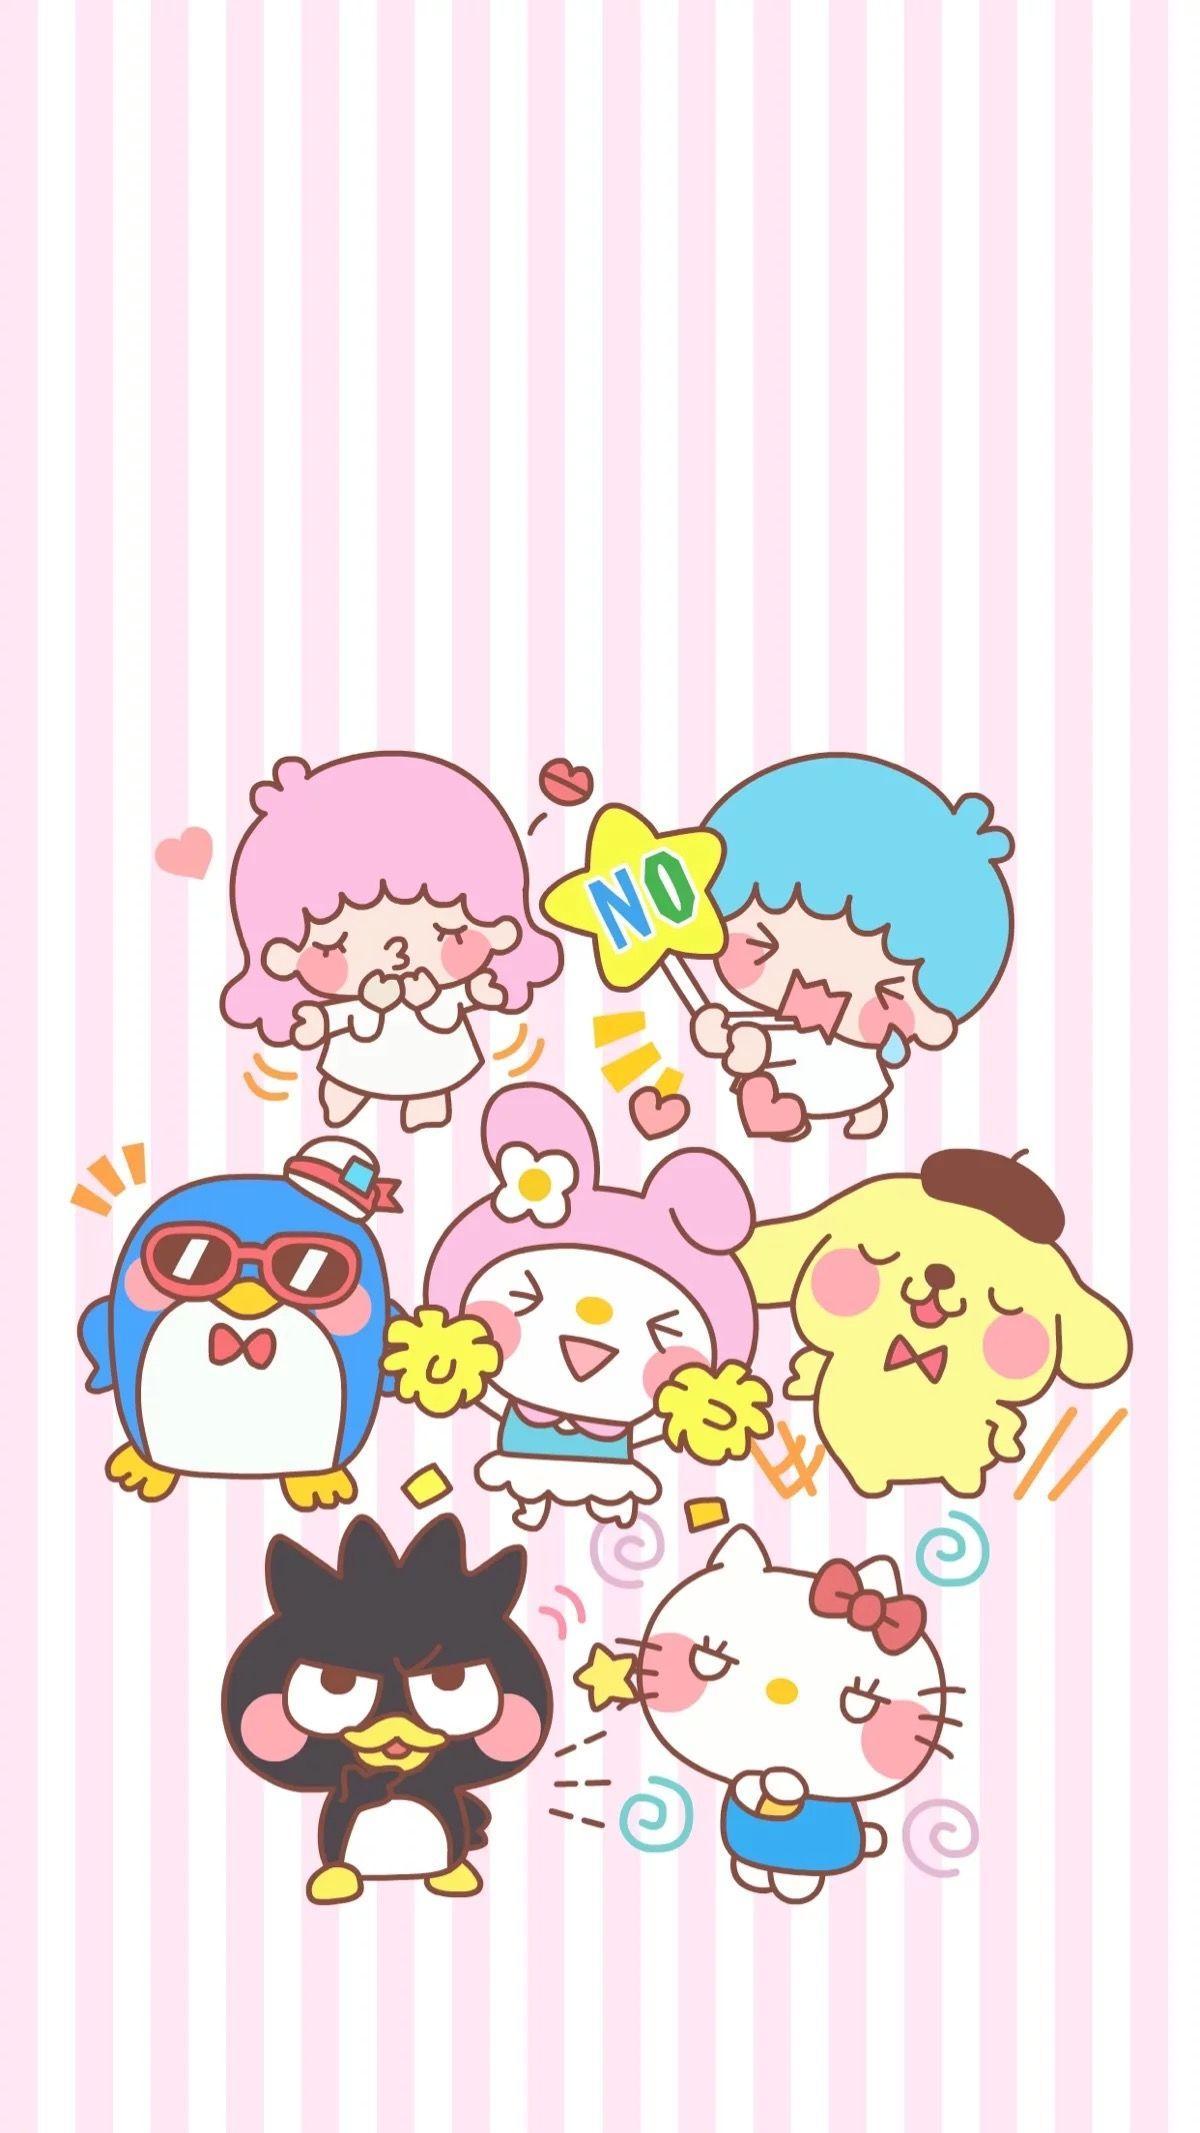 Cute Sanrio Wallpapers - Top Free Cute Sanrio Backgrounds ...